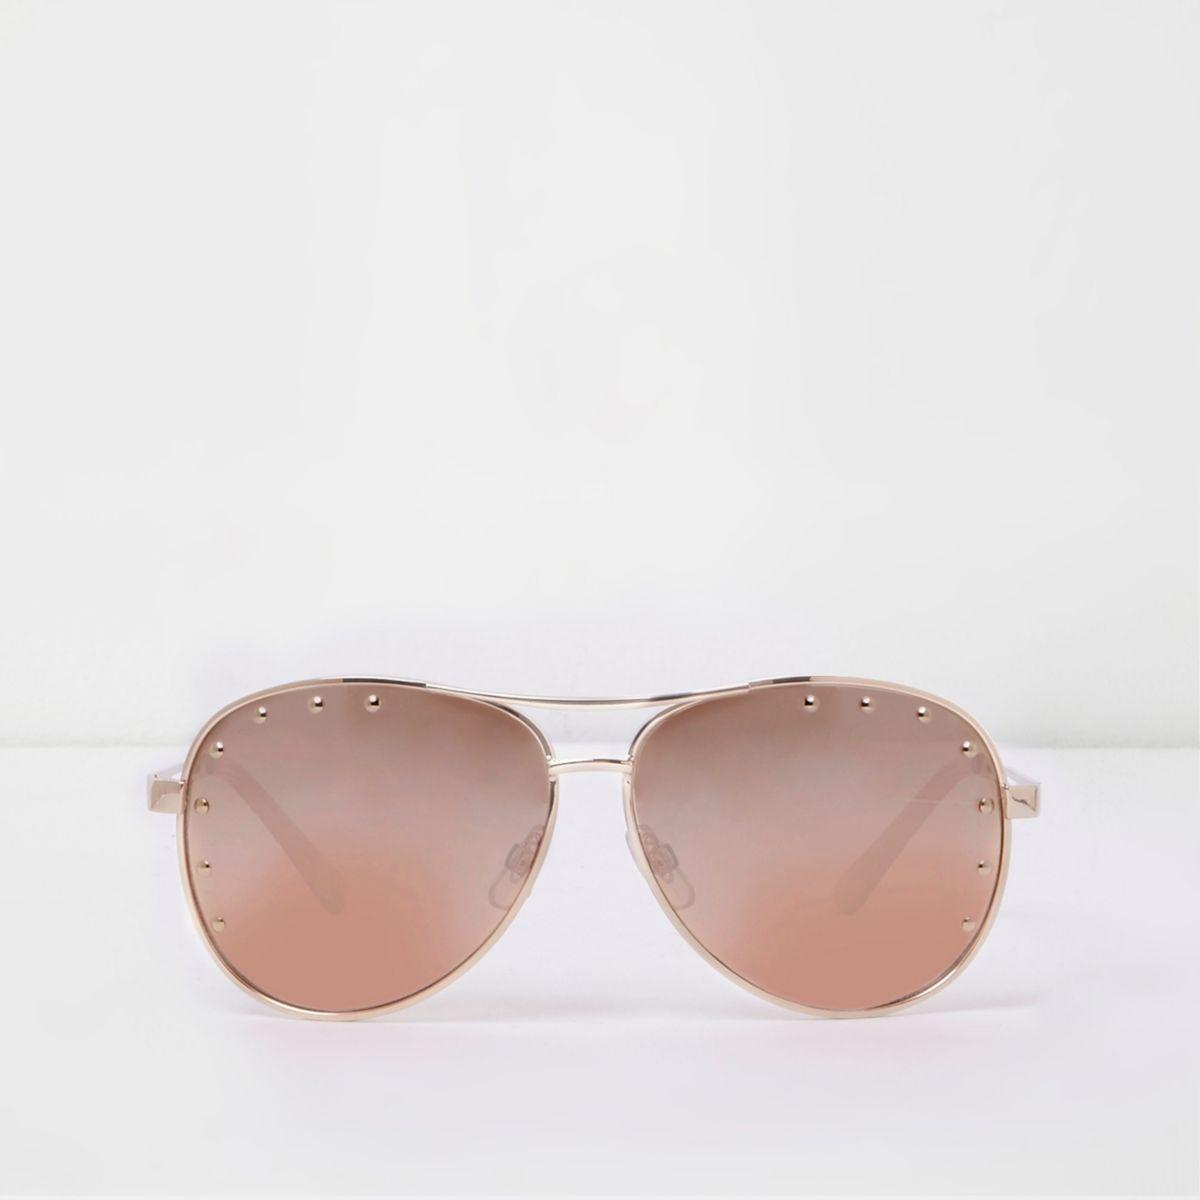 Pink gold tone studded aviator sunglasses